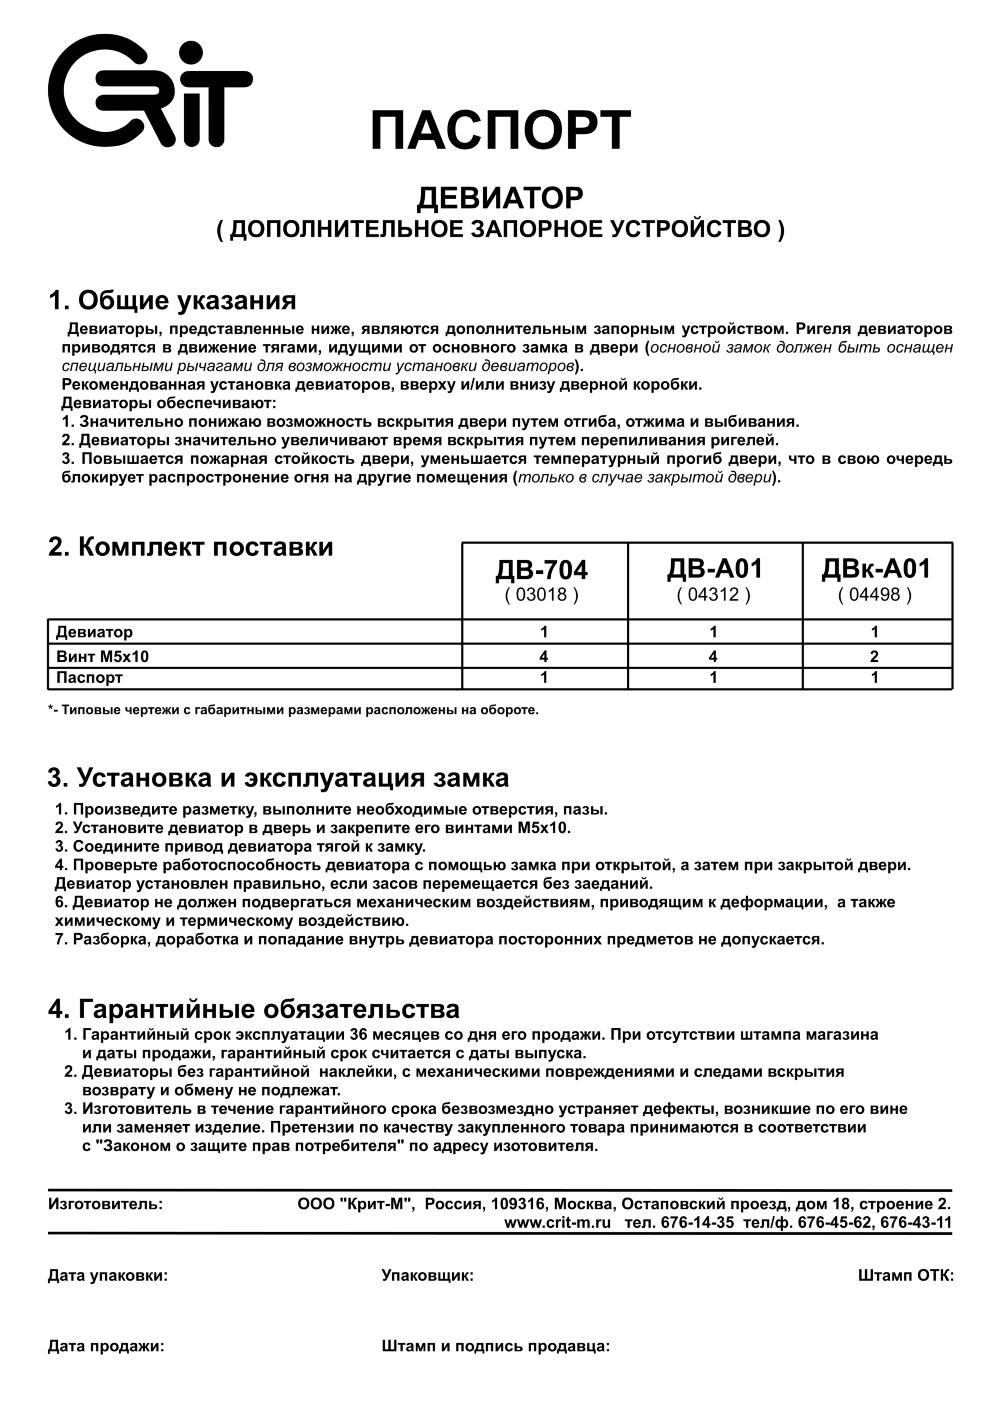 Паспорт девиатора Дв-А01 стр 1